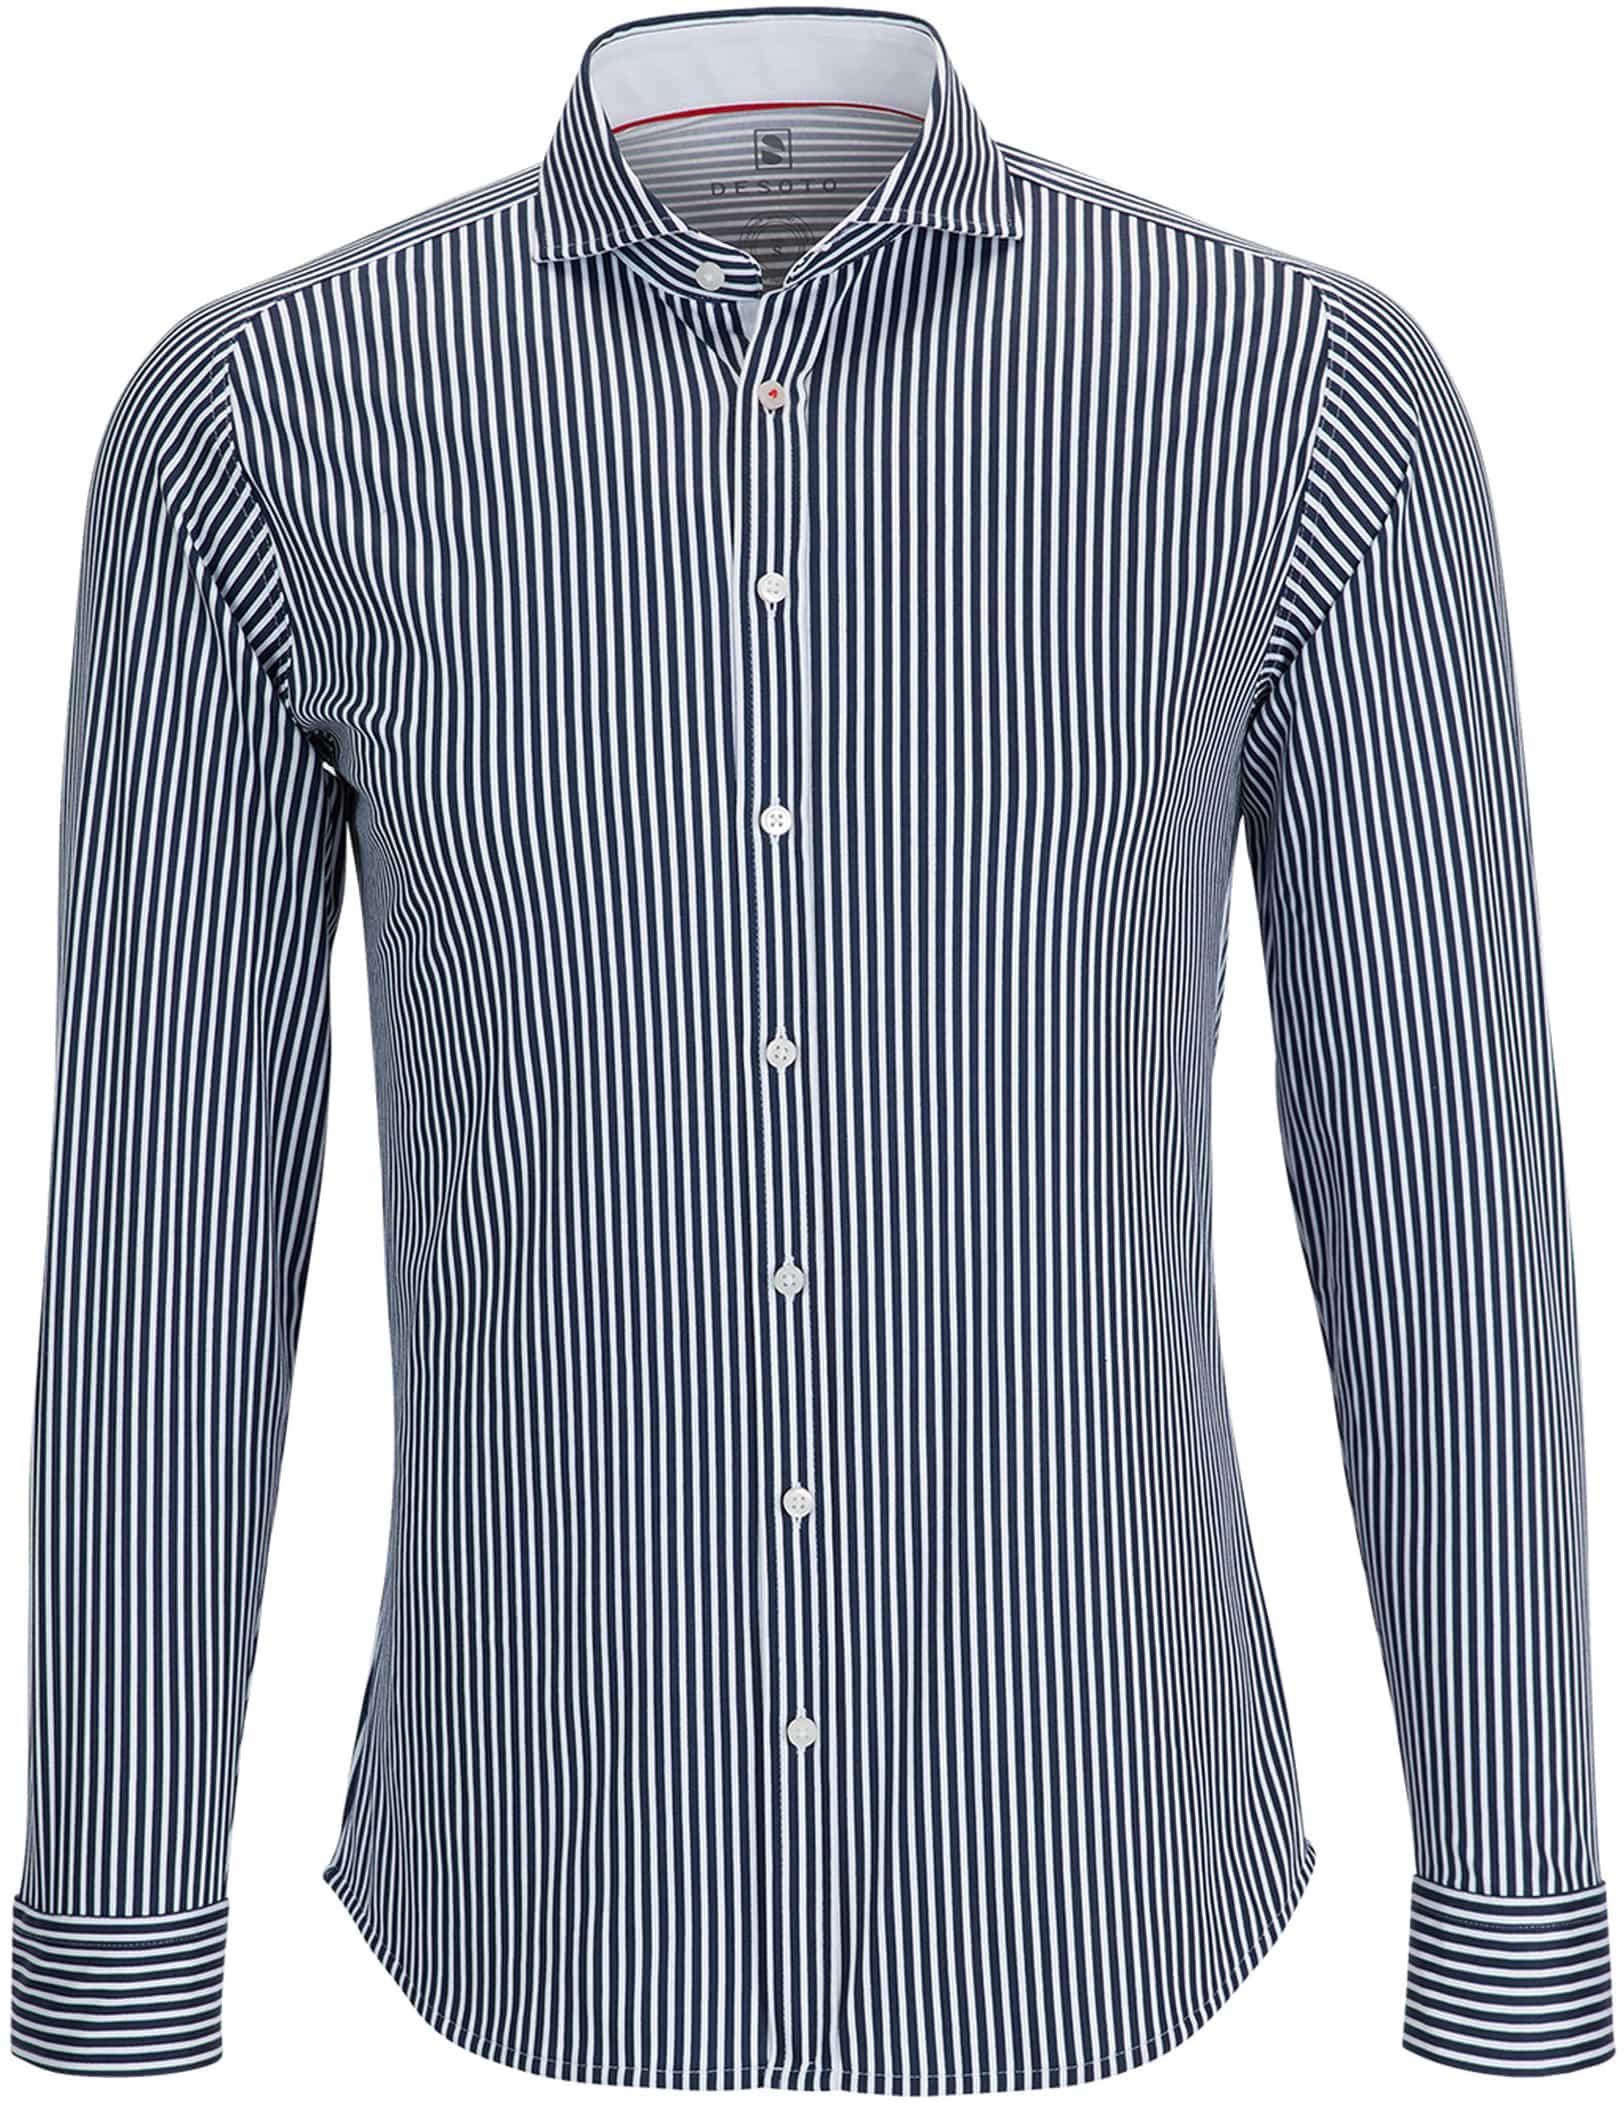 Desoto Overhemd Strijkvrij Donkerblauw Streep foto 0